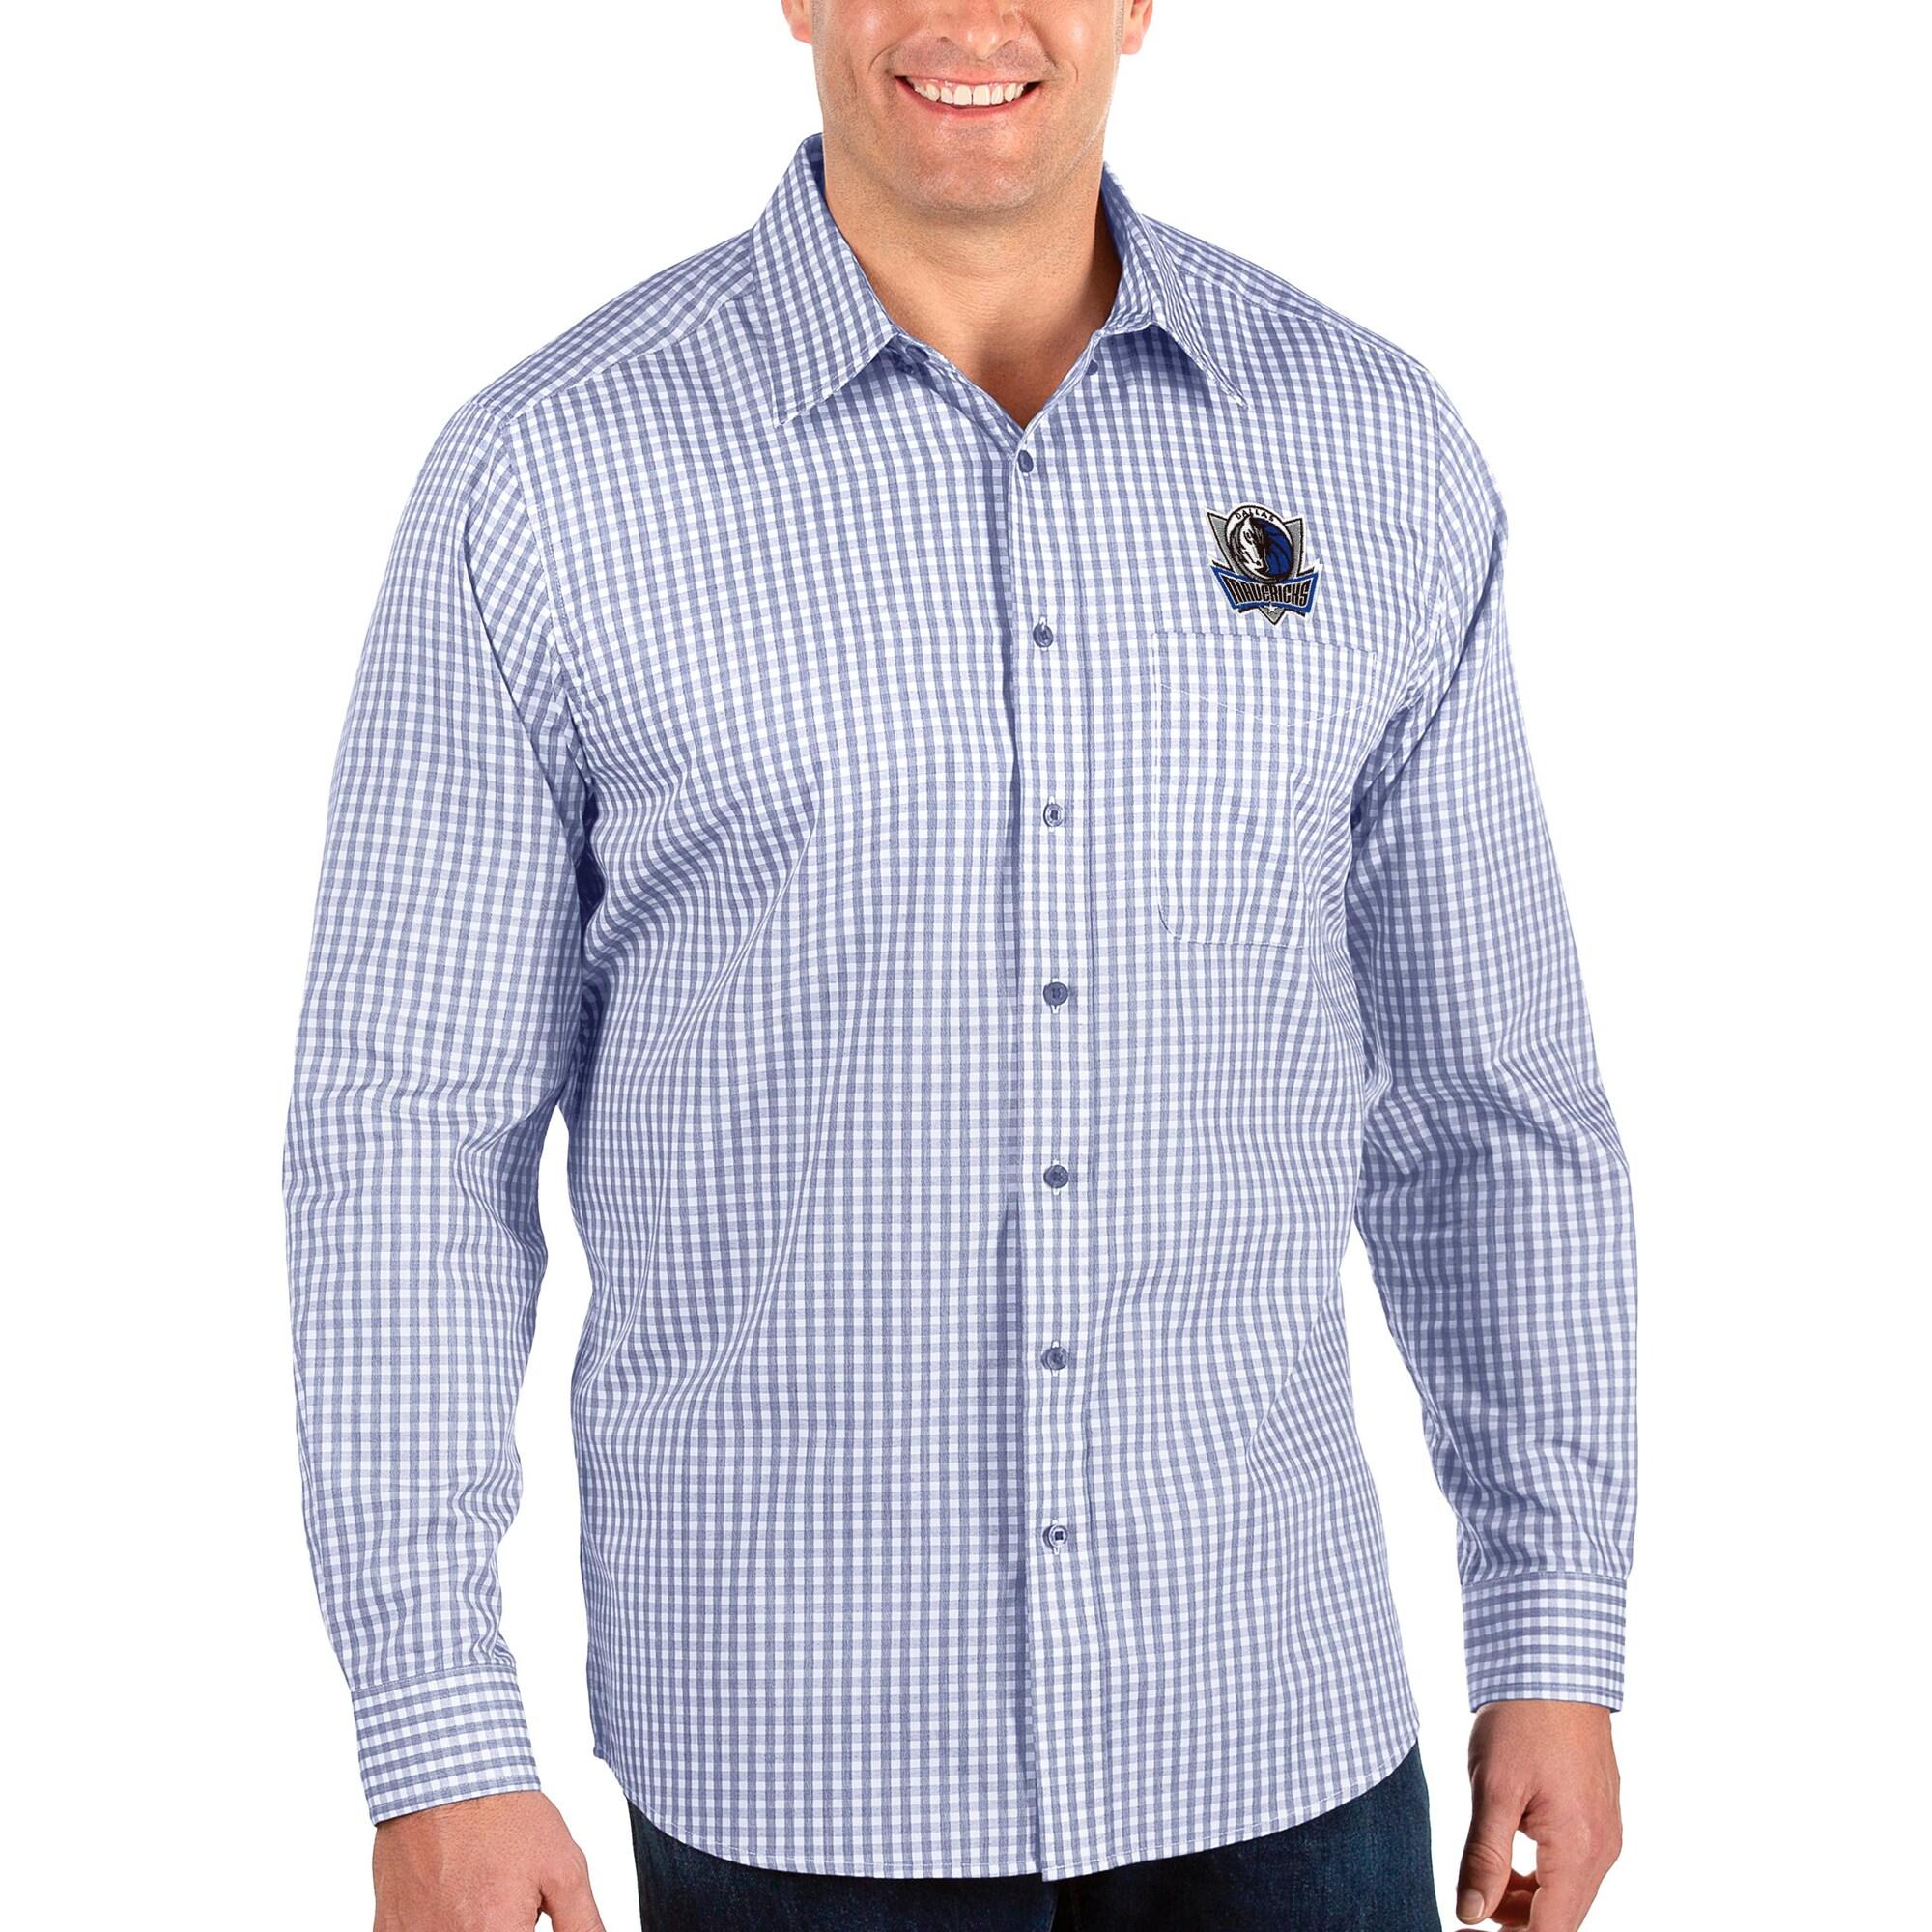 Dallas Mavericks Antigua Big & Tall Structure Long Sleeve Button-Up Shirt - Royal/White